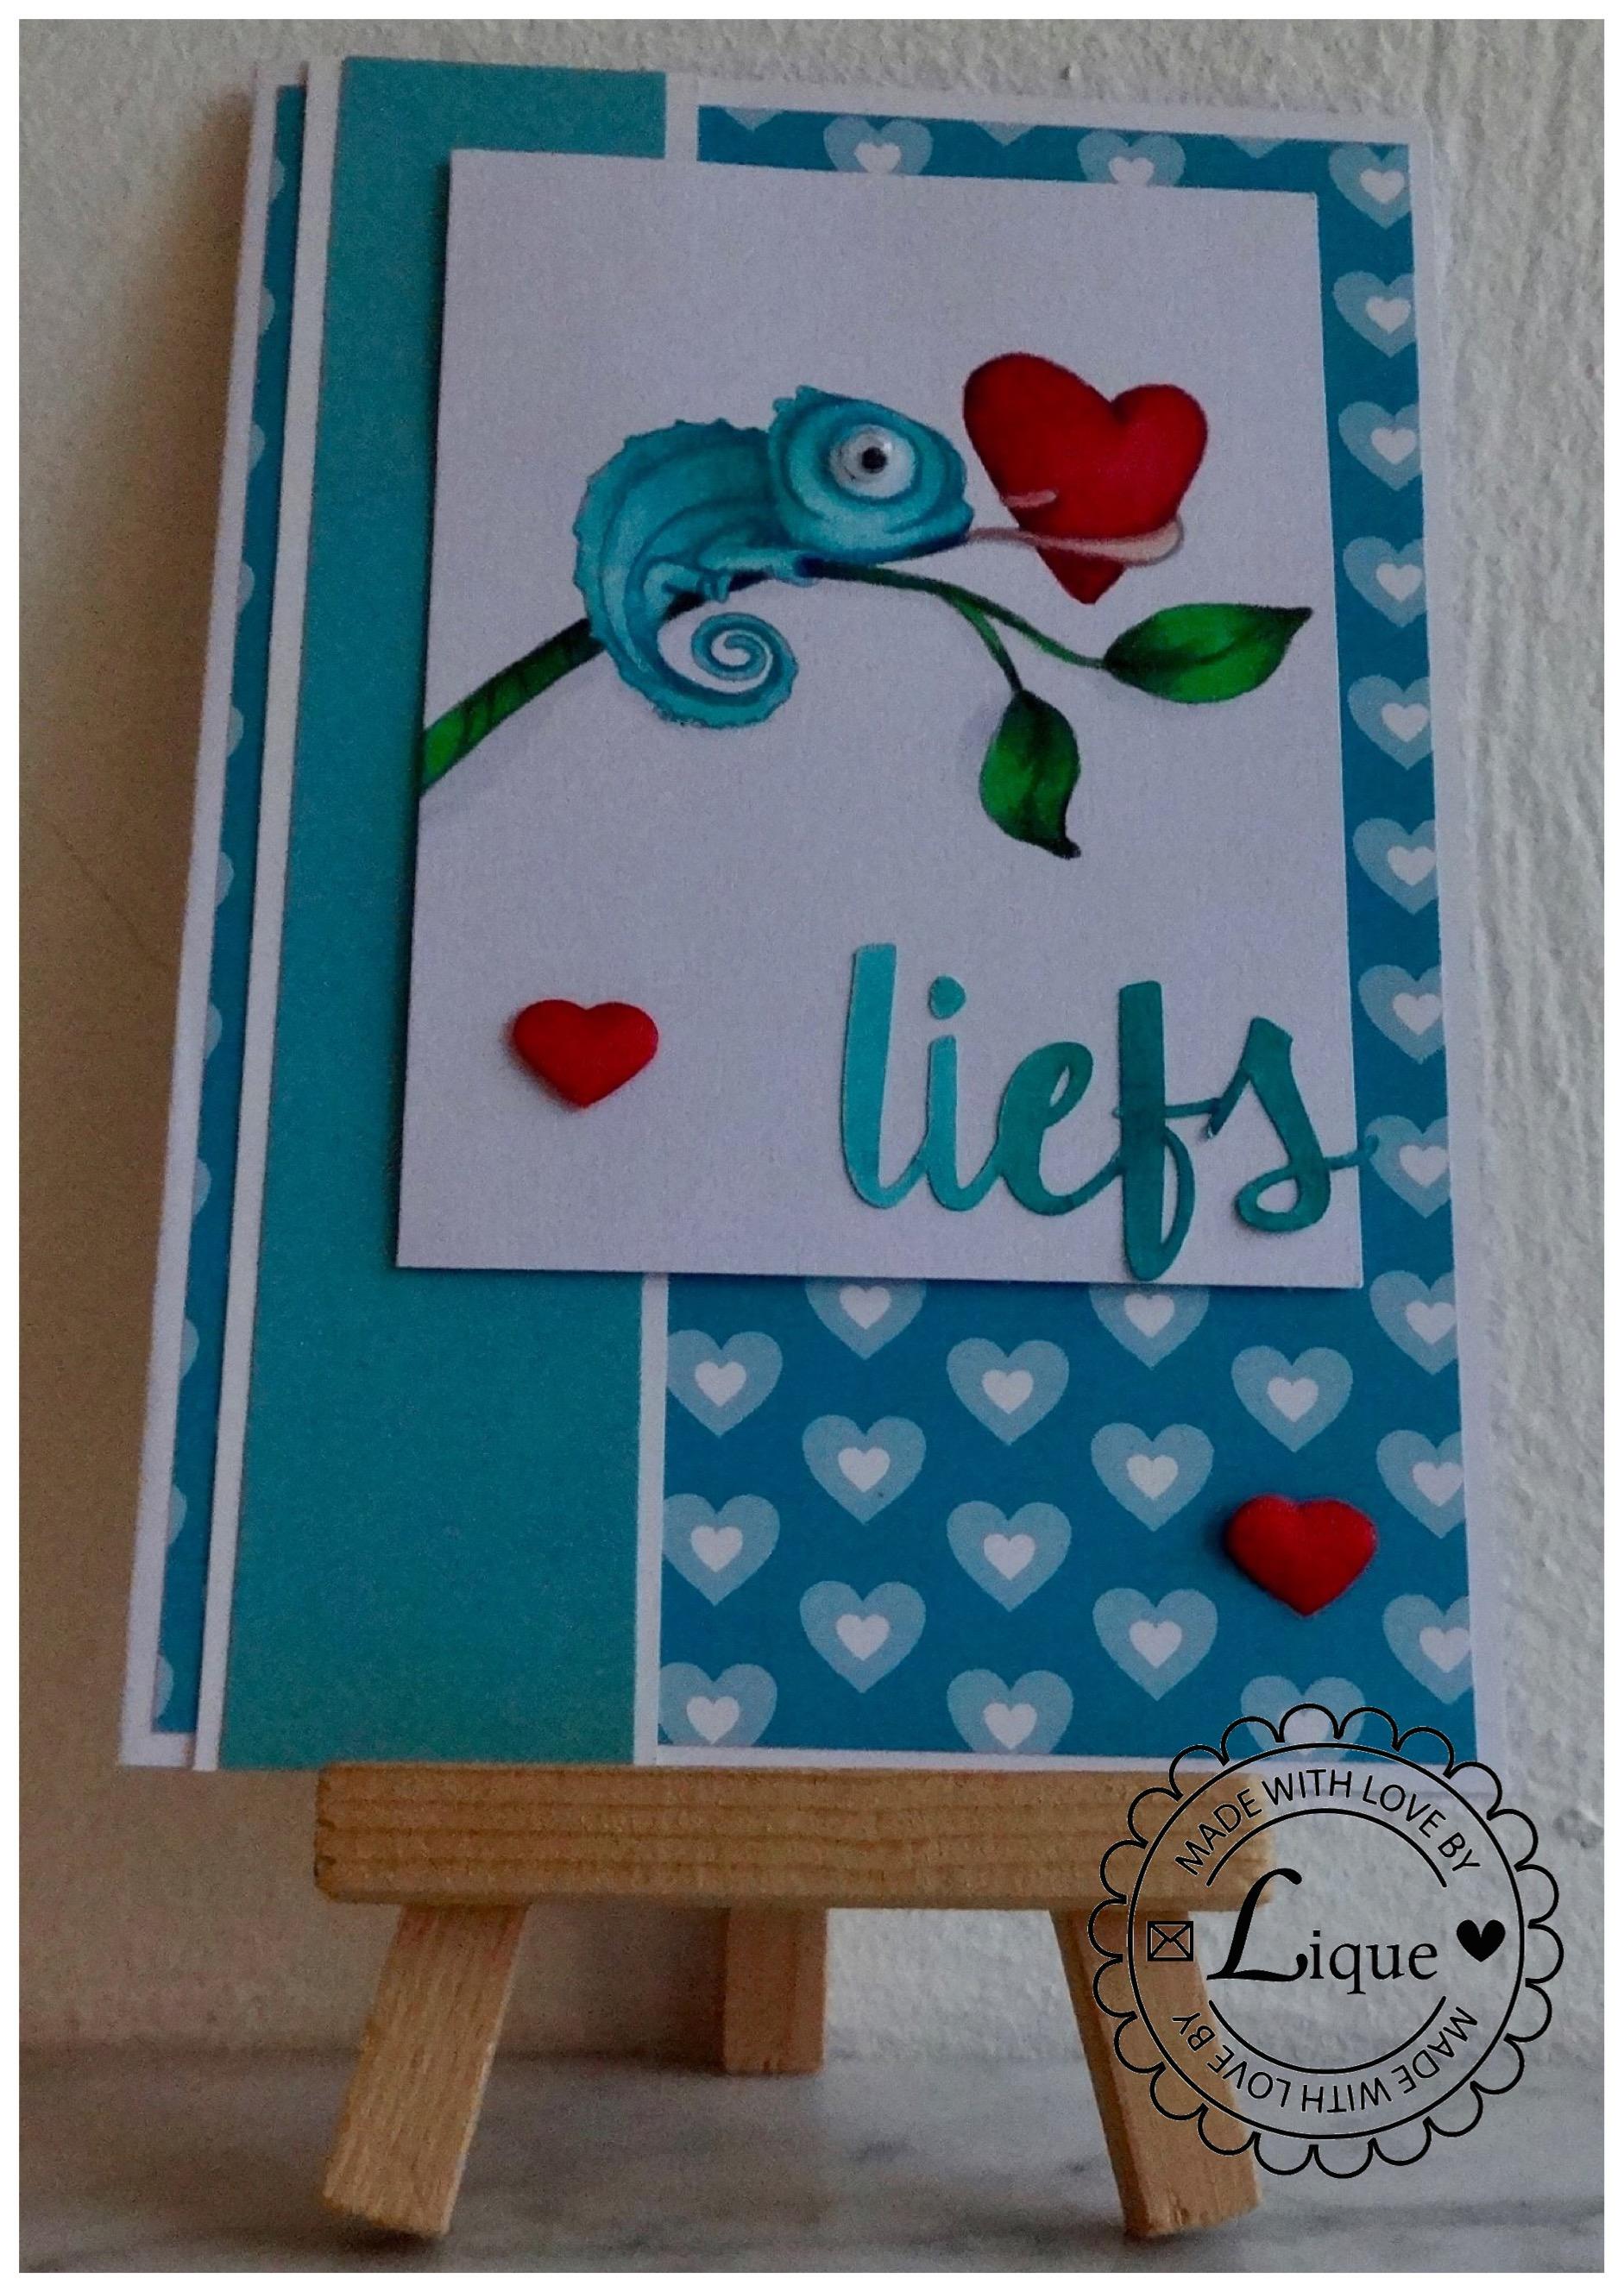 Liefs (with love) gecko